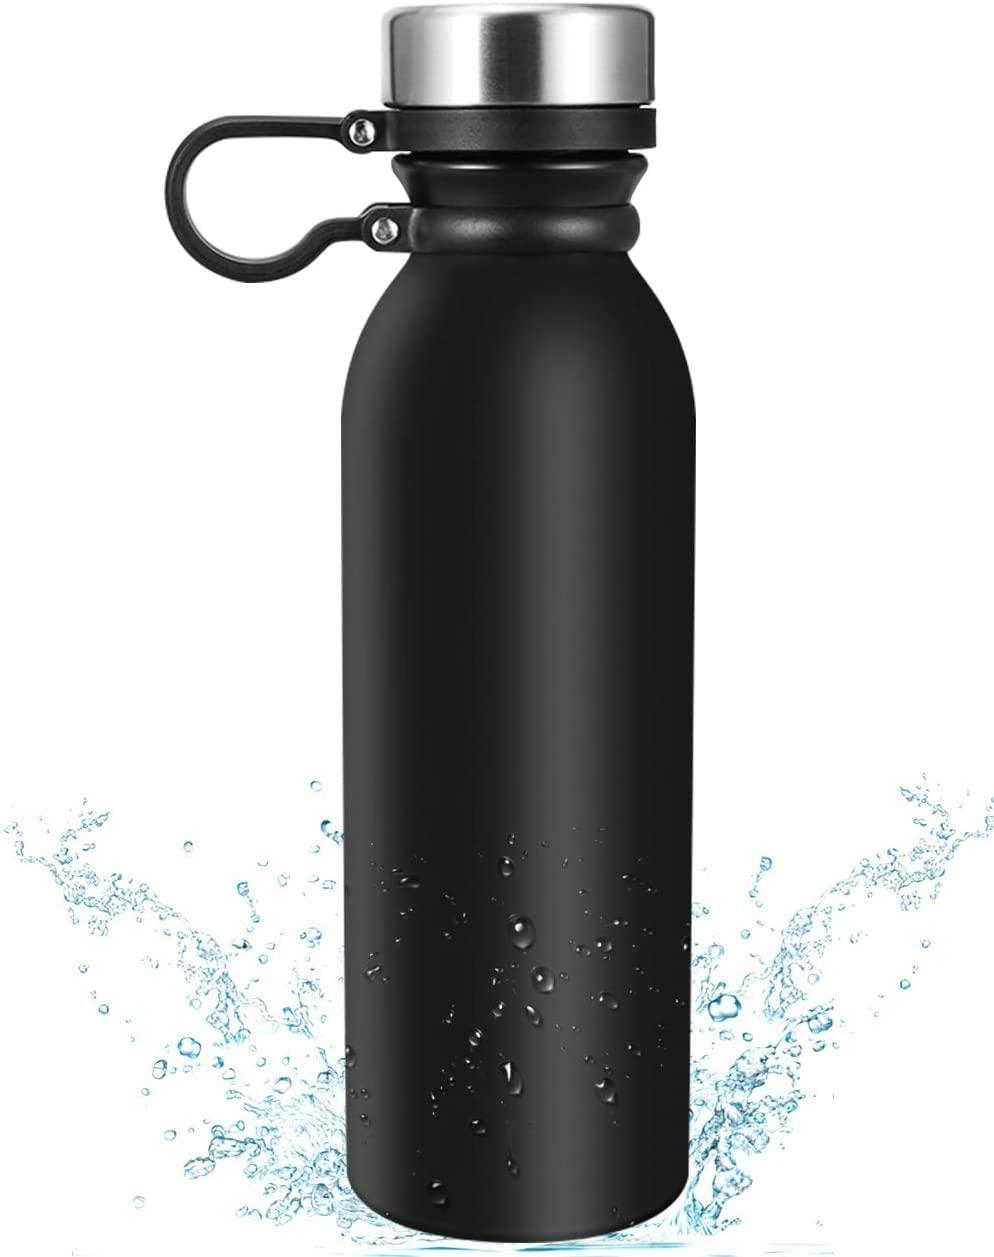 Eccomum 20 oz Vacuum Thermo Flask $7.98 + Free Shipping